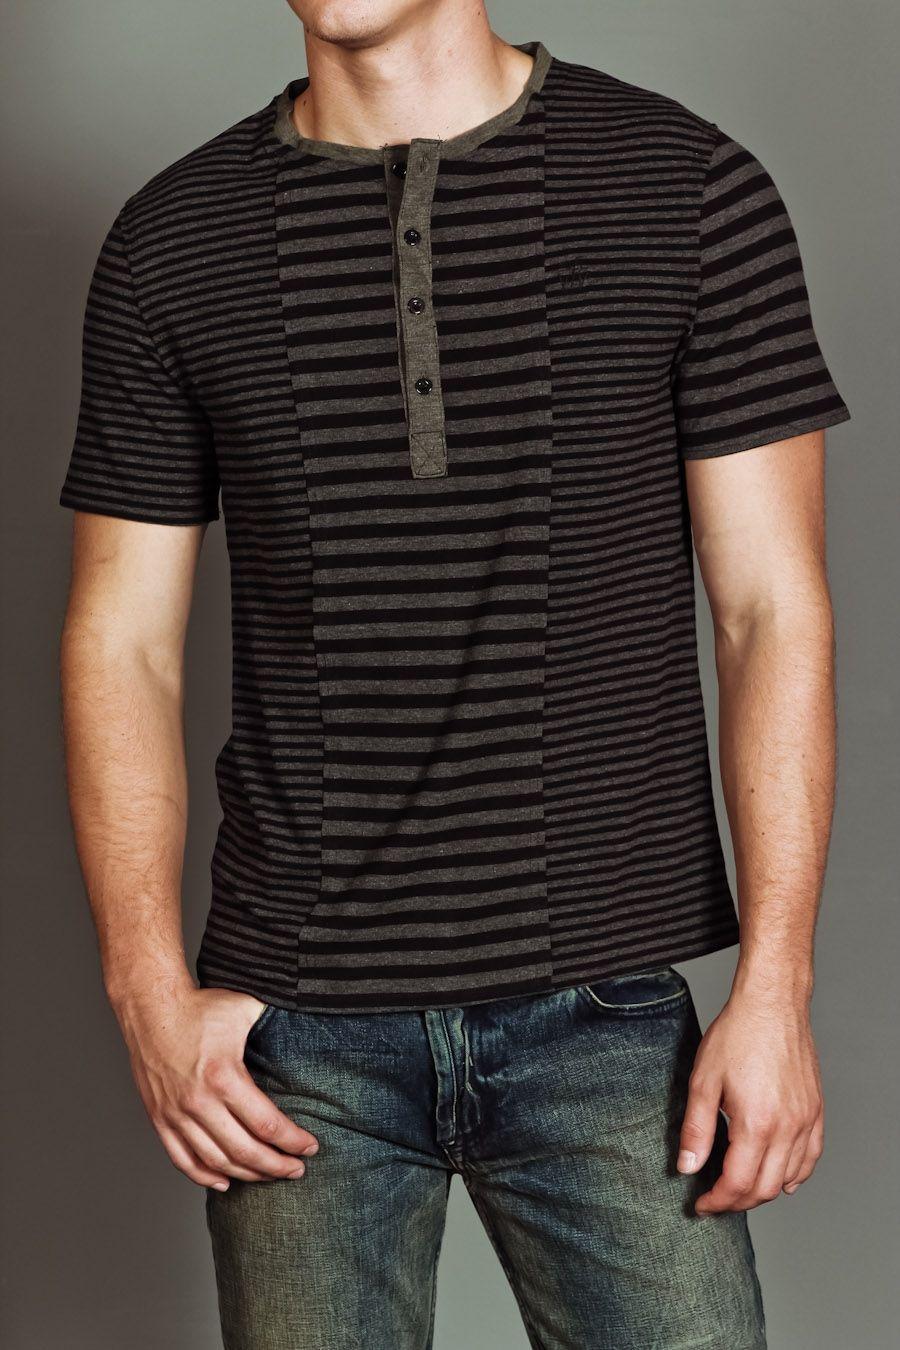 Doppleganger Logan Striped S/S Henley Black/Charcoal